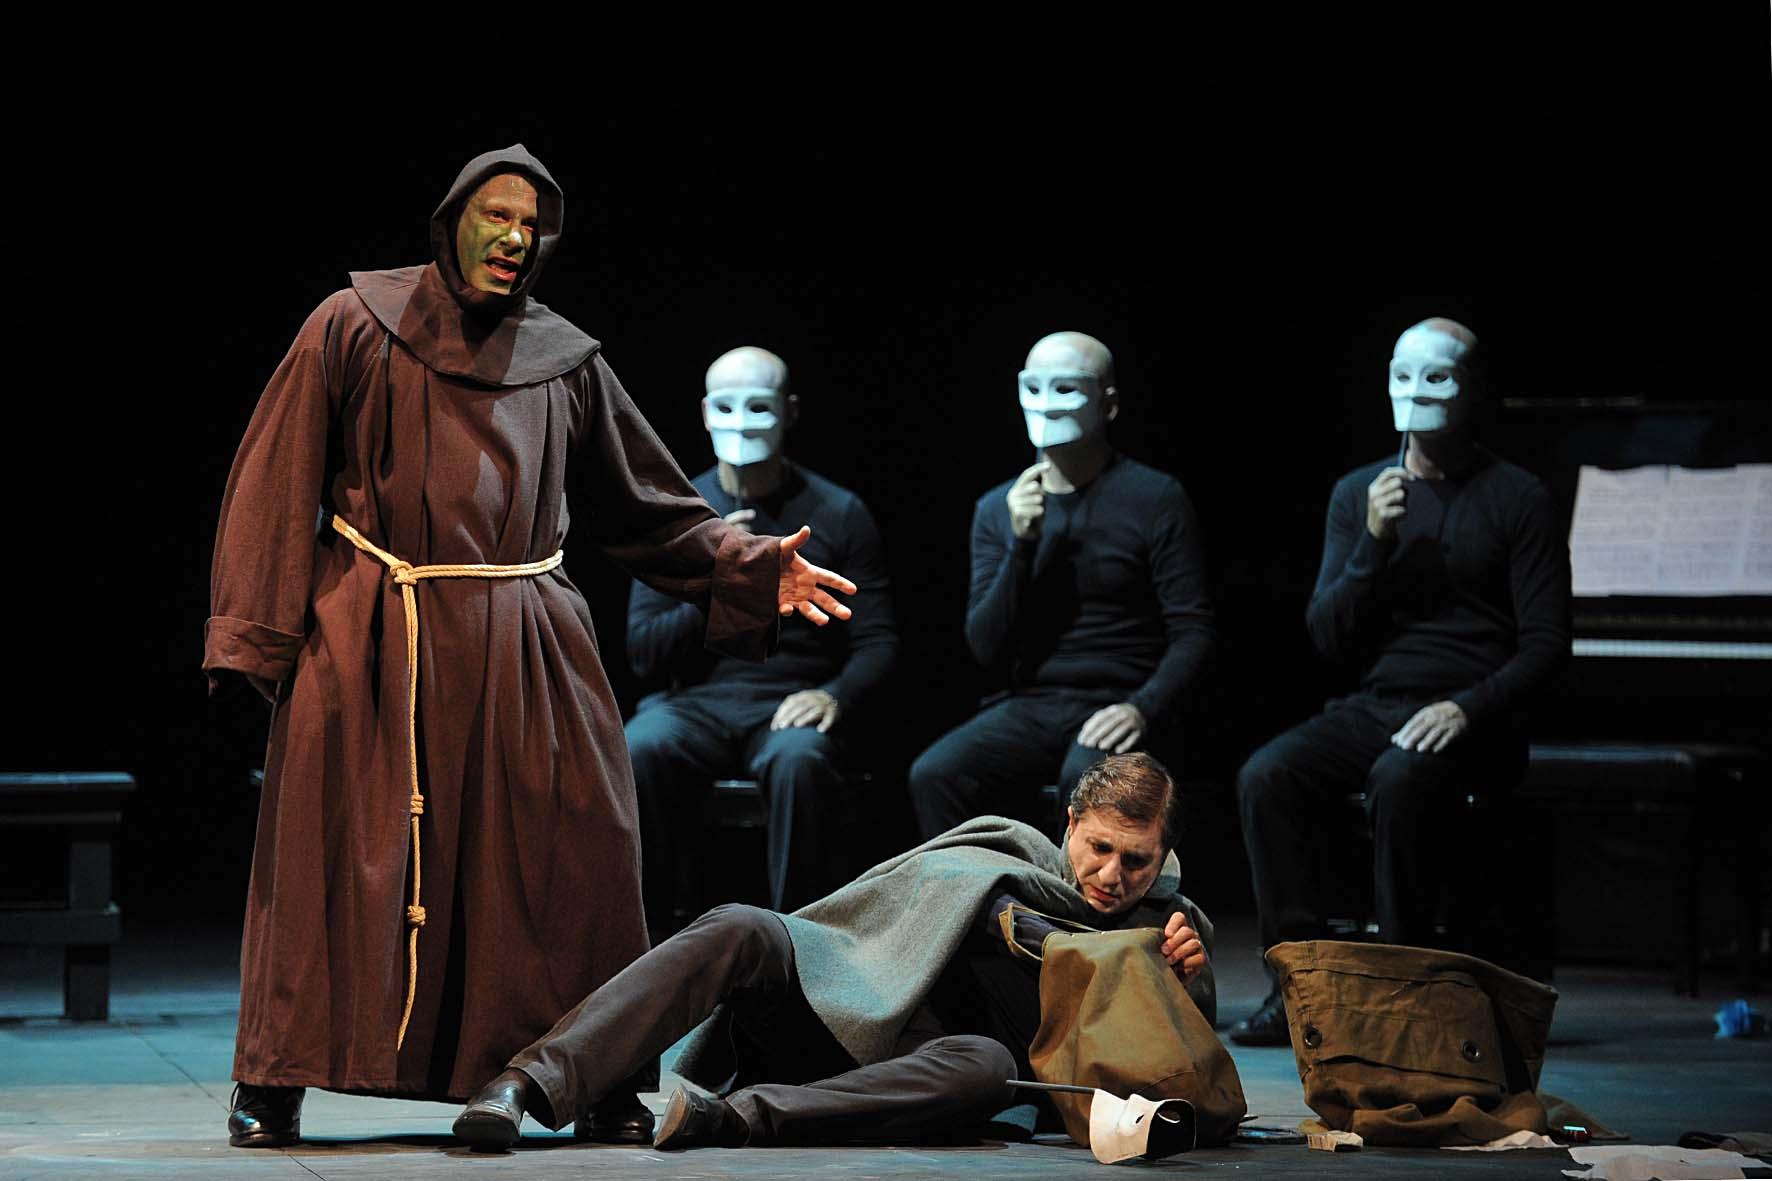 Monteverdi-Stravinskij secondo De Simone: matrimonio a rischio